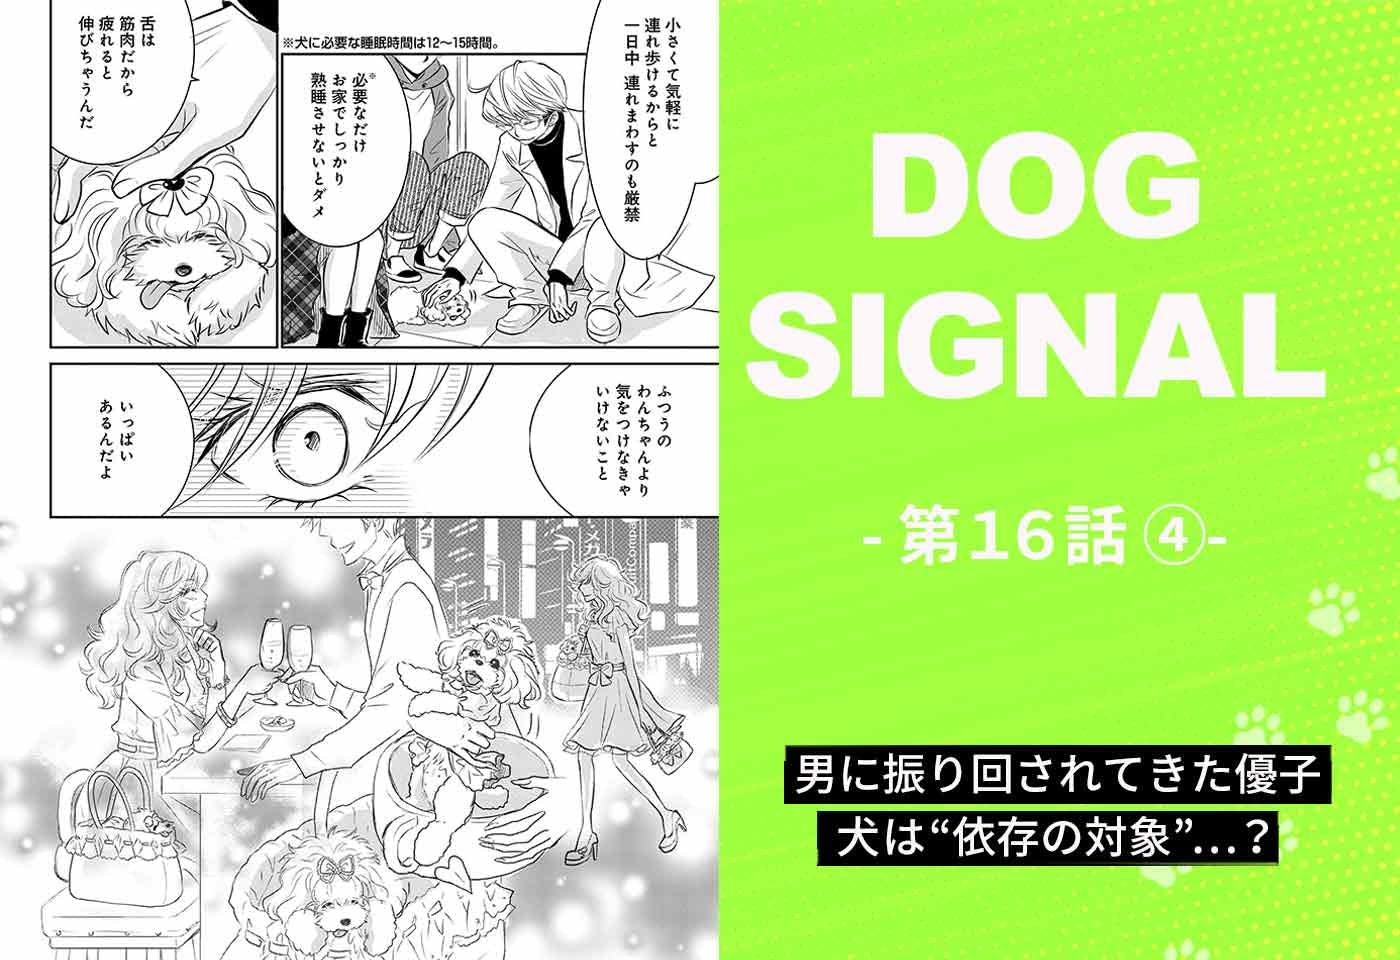 『DOG SIGNAL』16話目 4/4